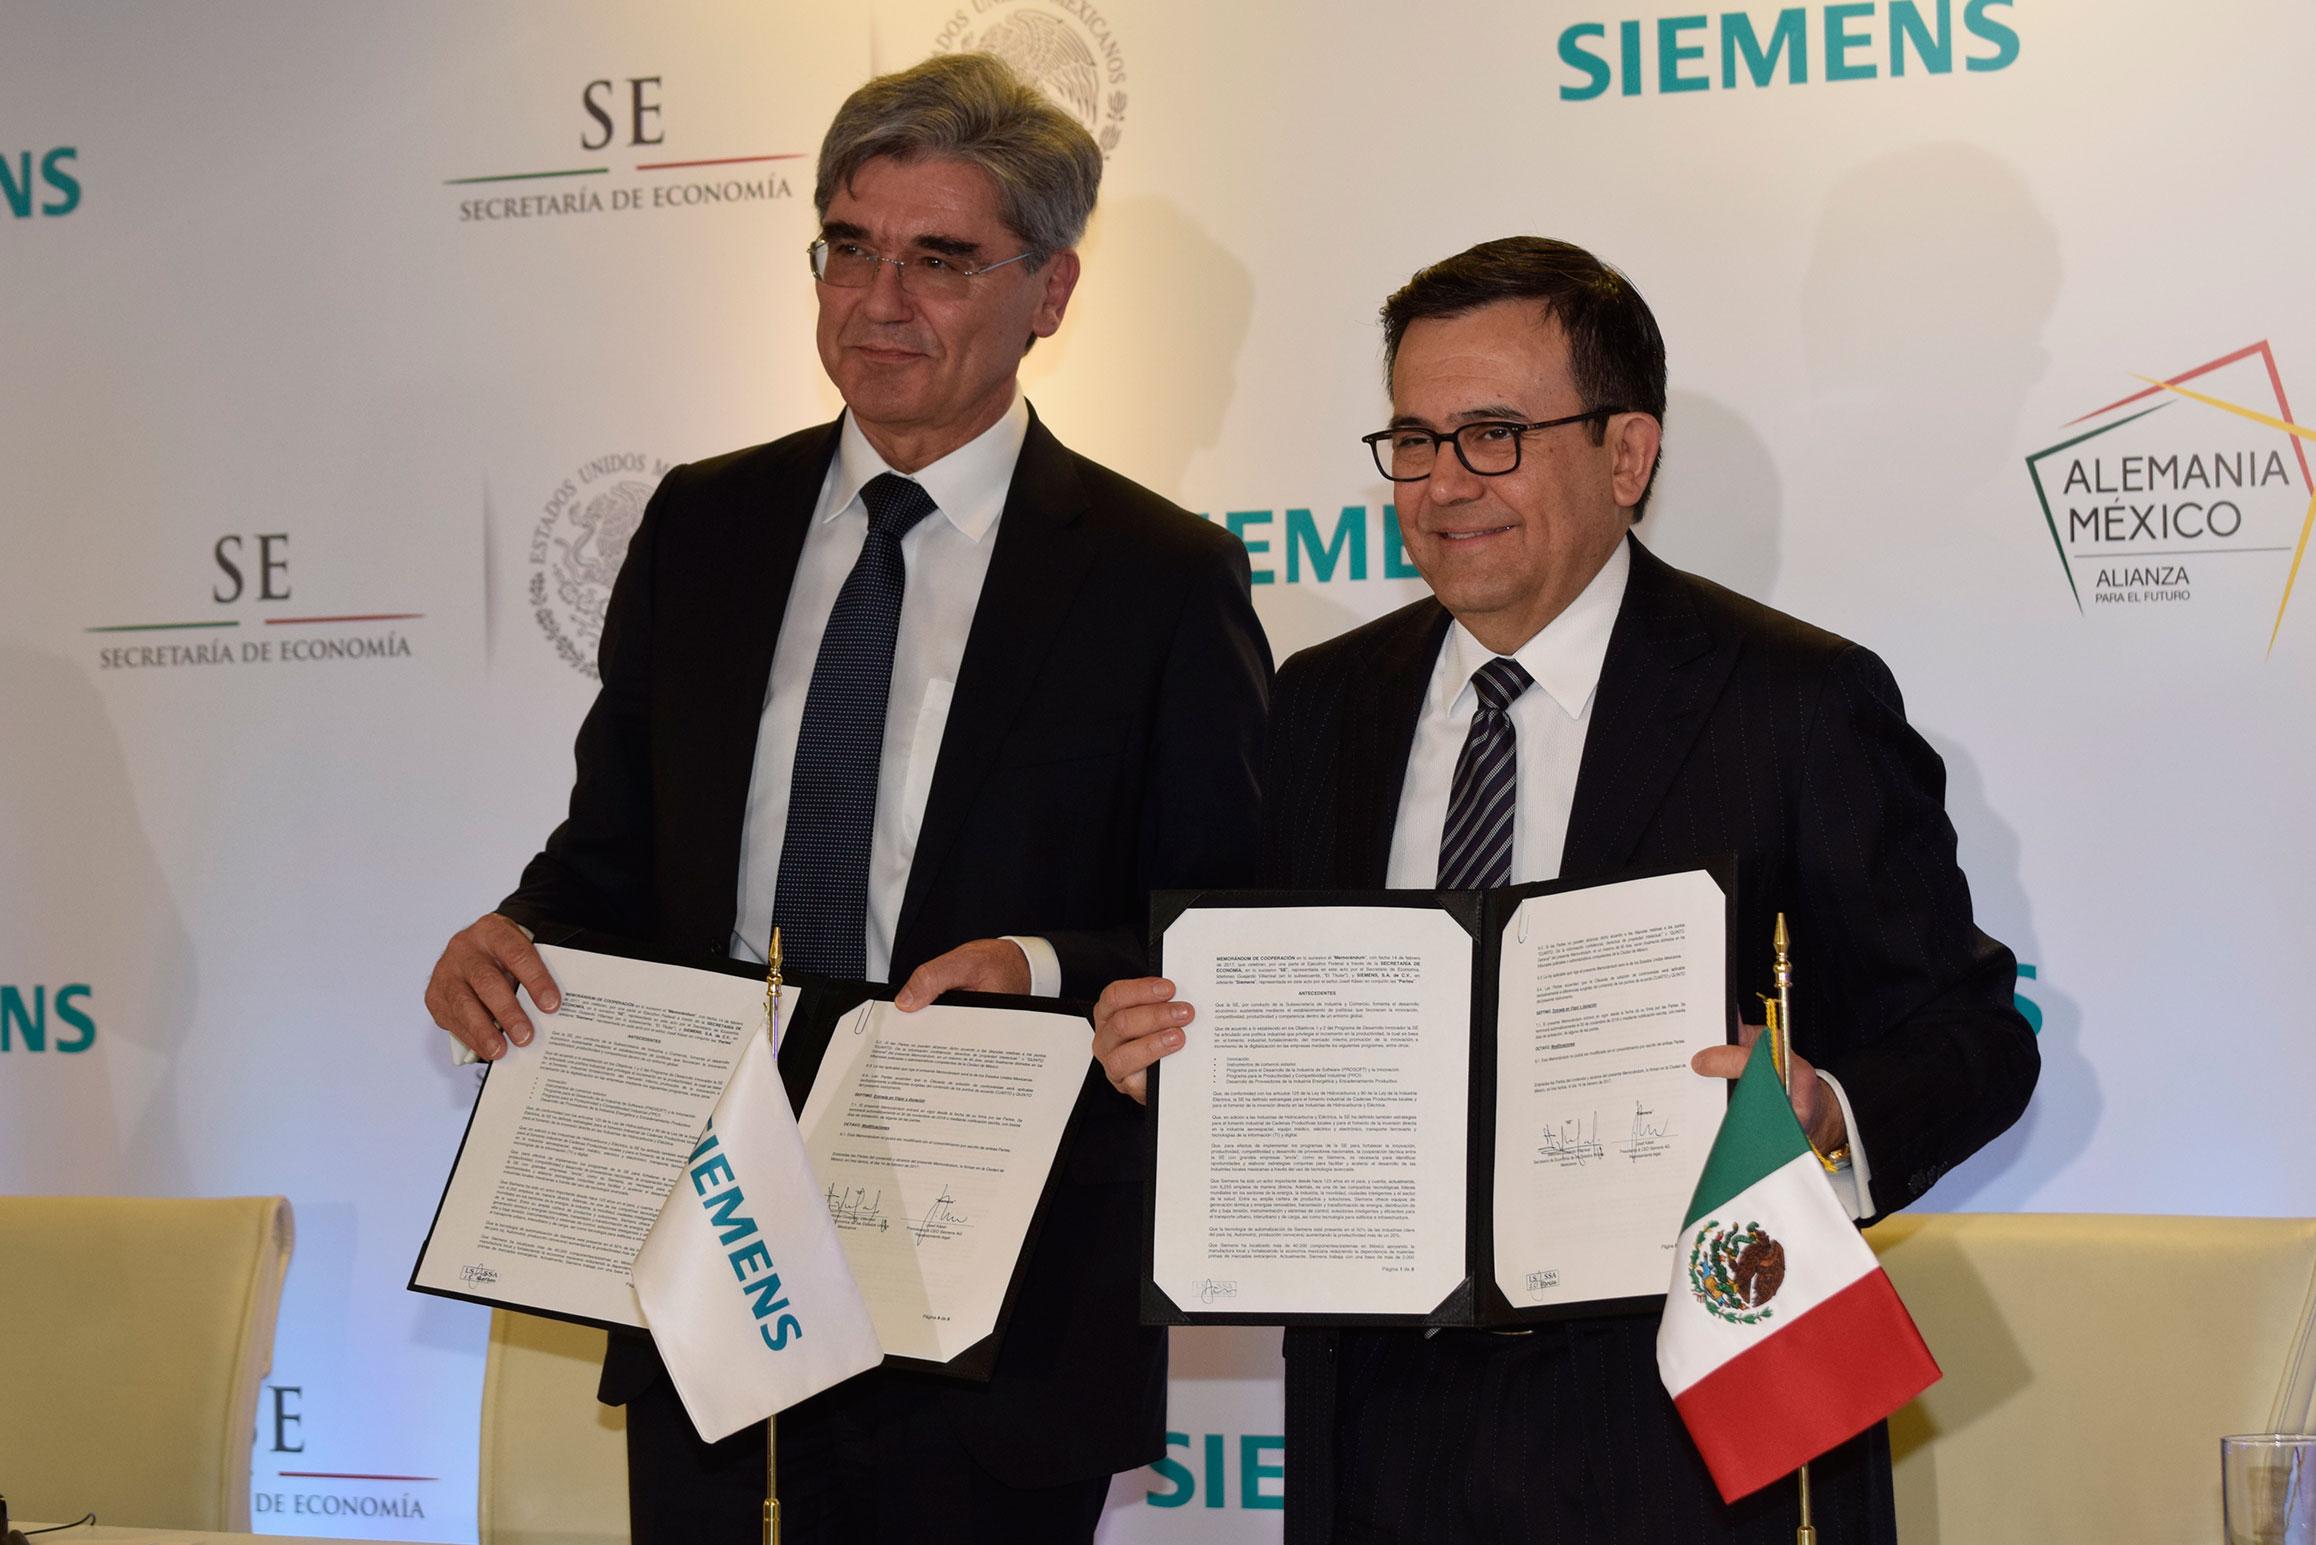 Joe Kaeser, presidente y CEO de Siemens, e Ildefonso Guajardo Villarreal, secretario de Economía